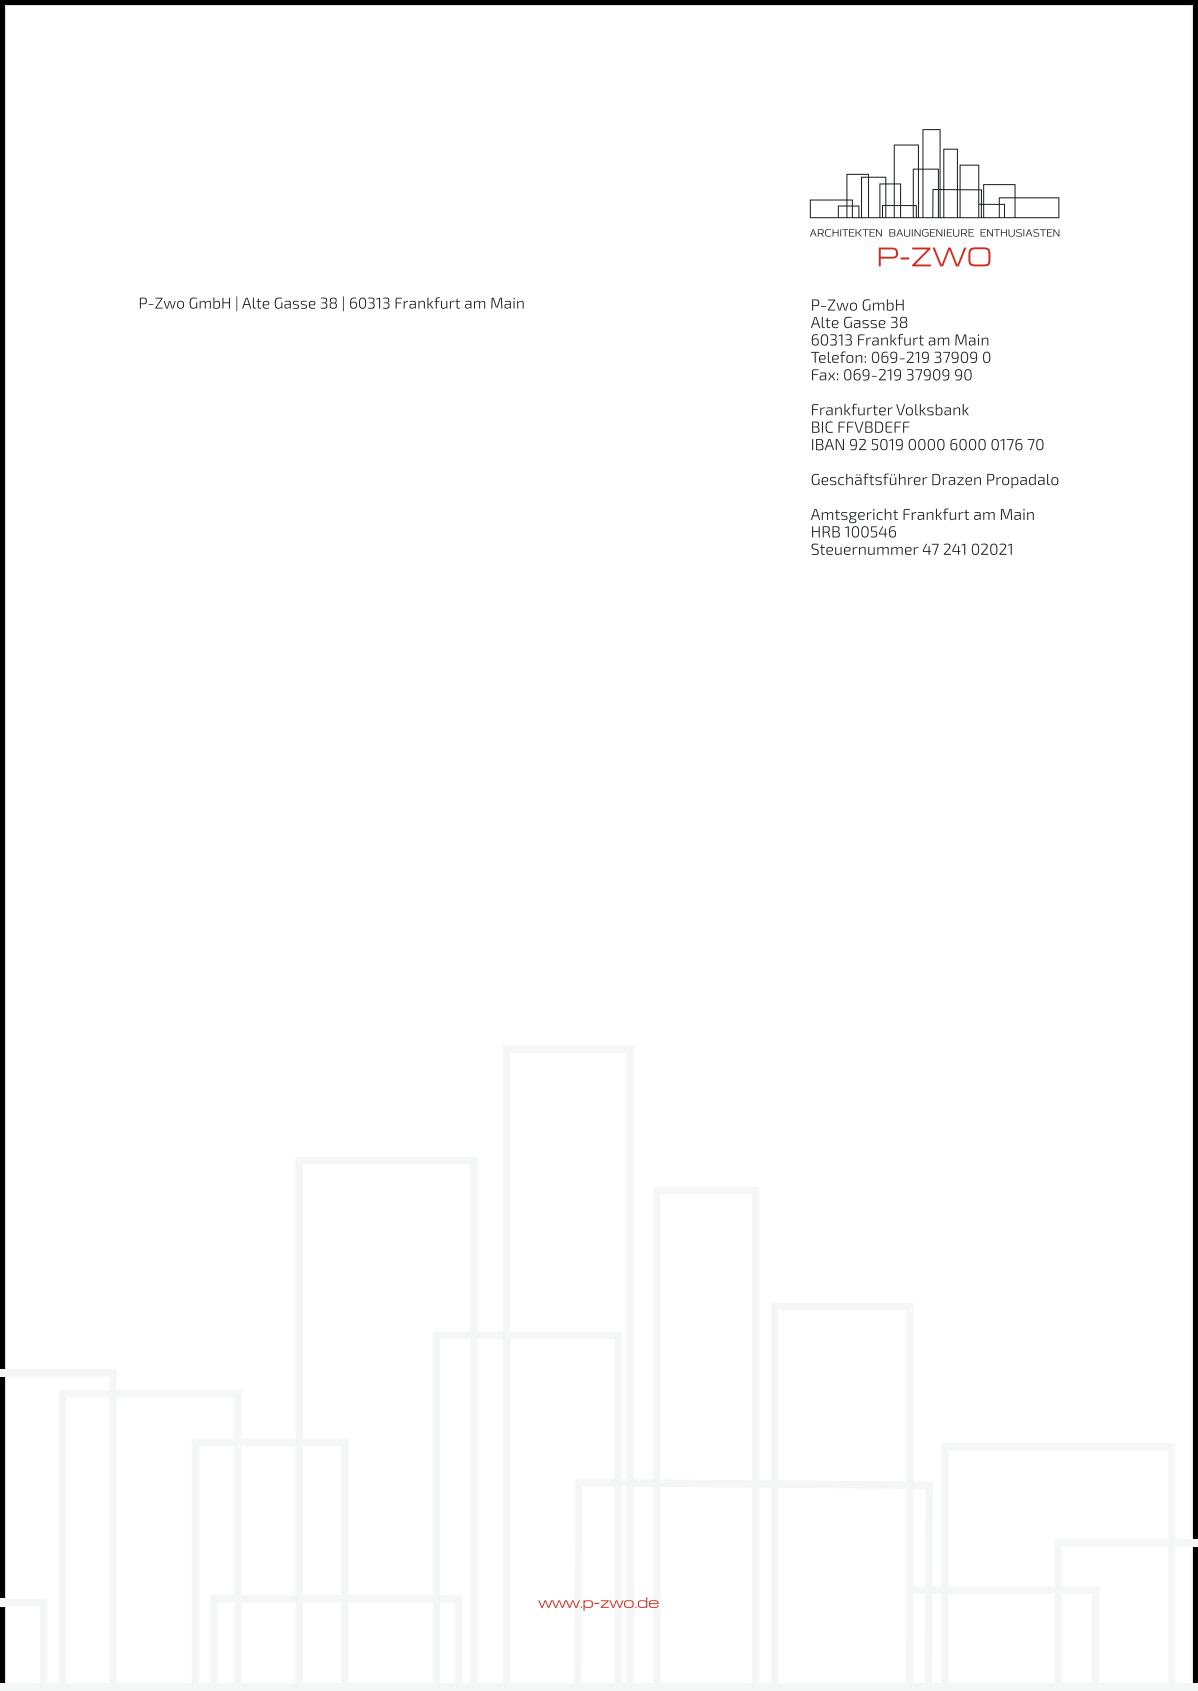 Letterhead design for P-ZWO